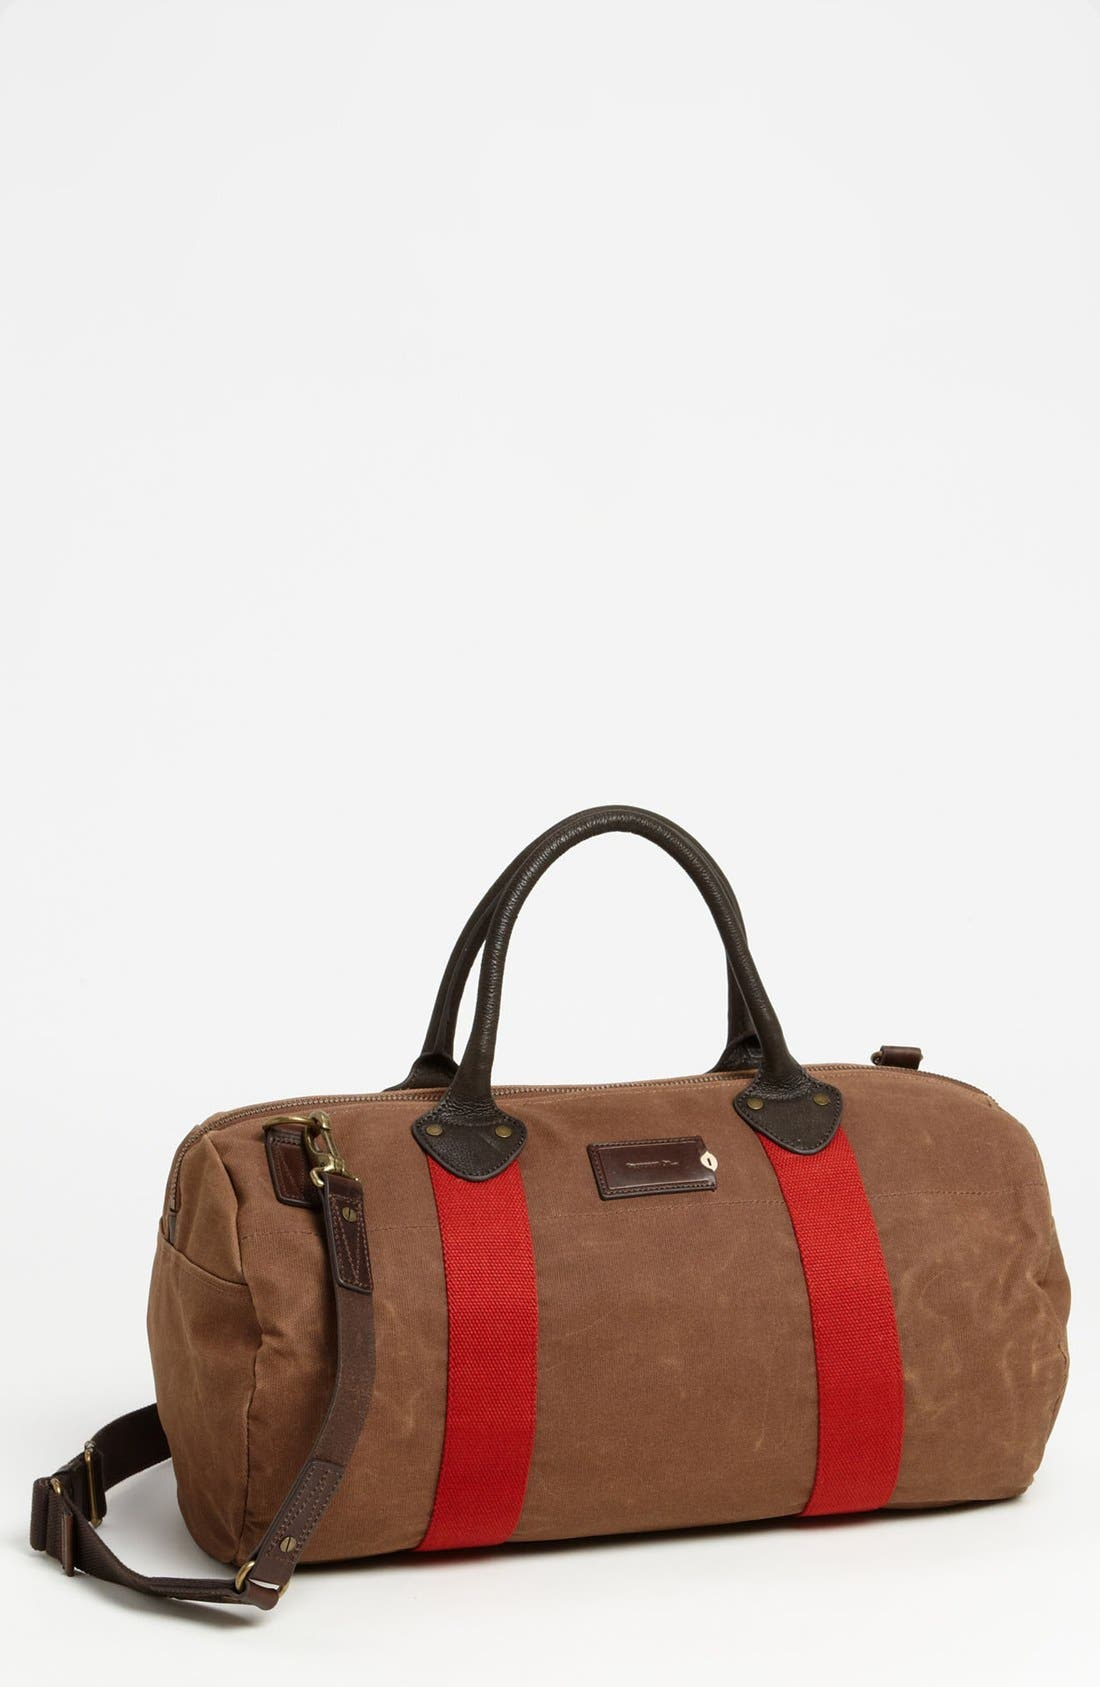 Alternate Image 1 Selected - Property Of... 'Rafe' Boston Bag